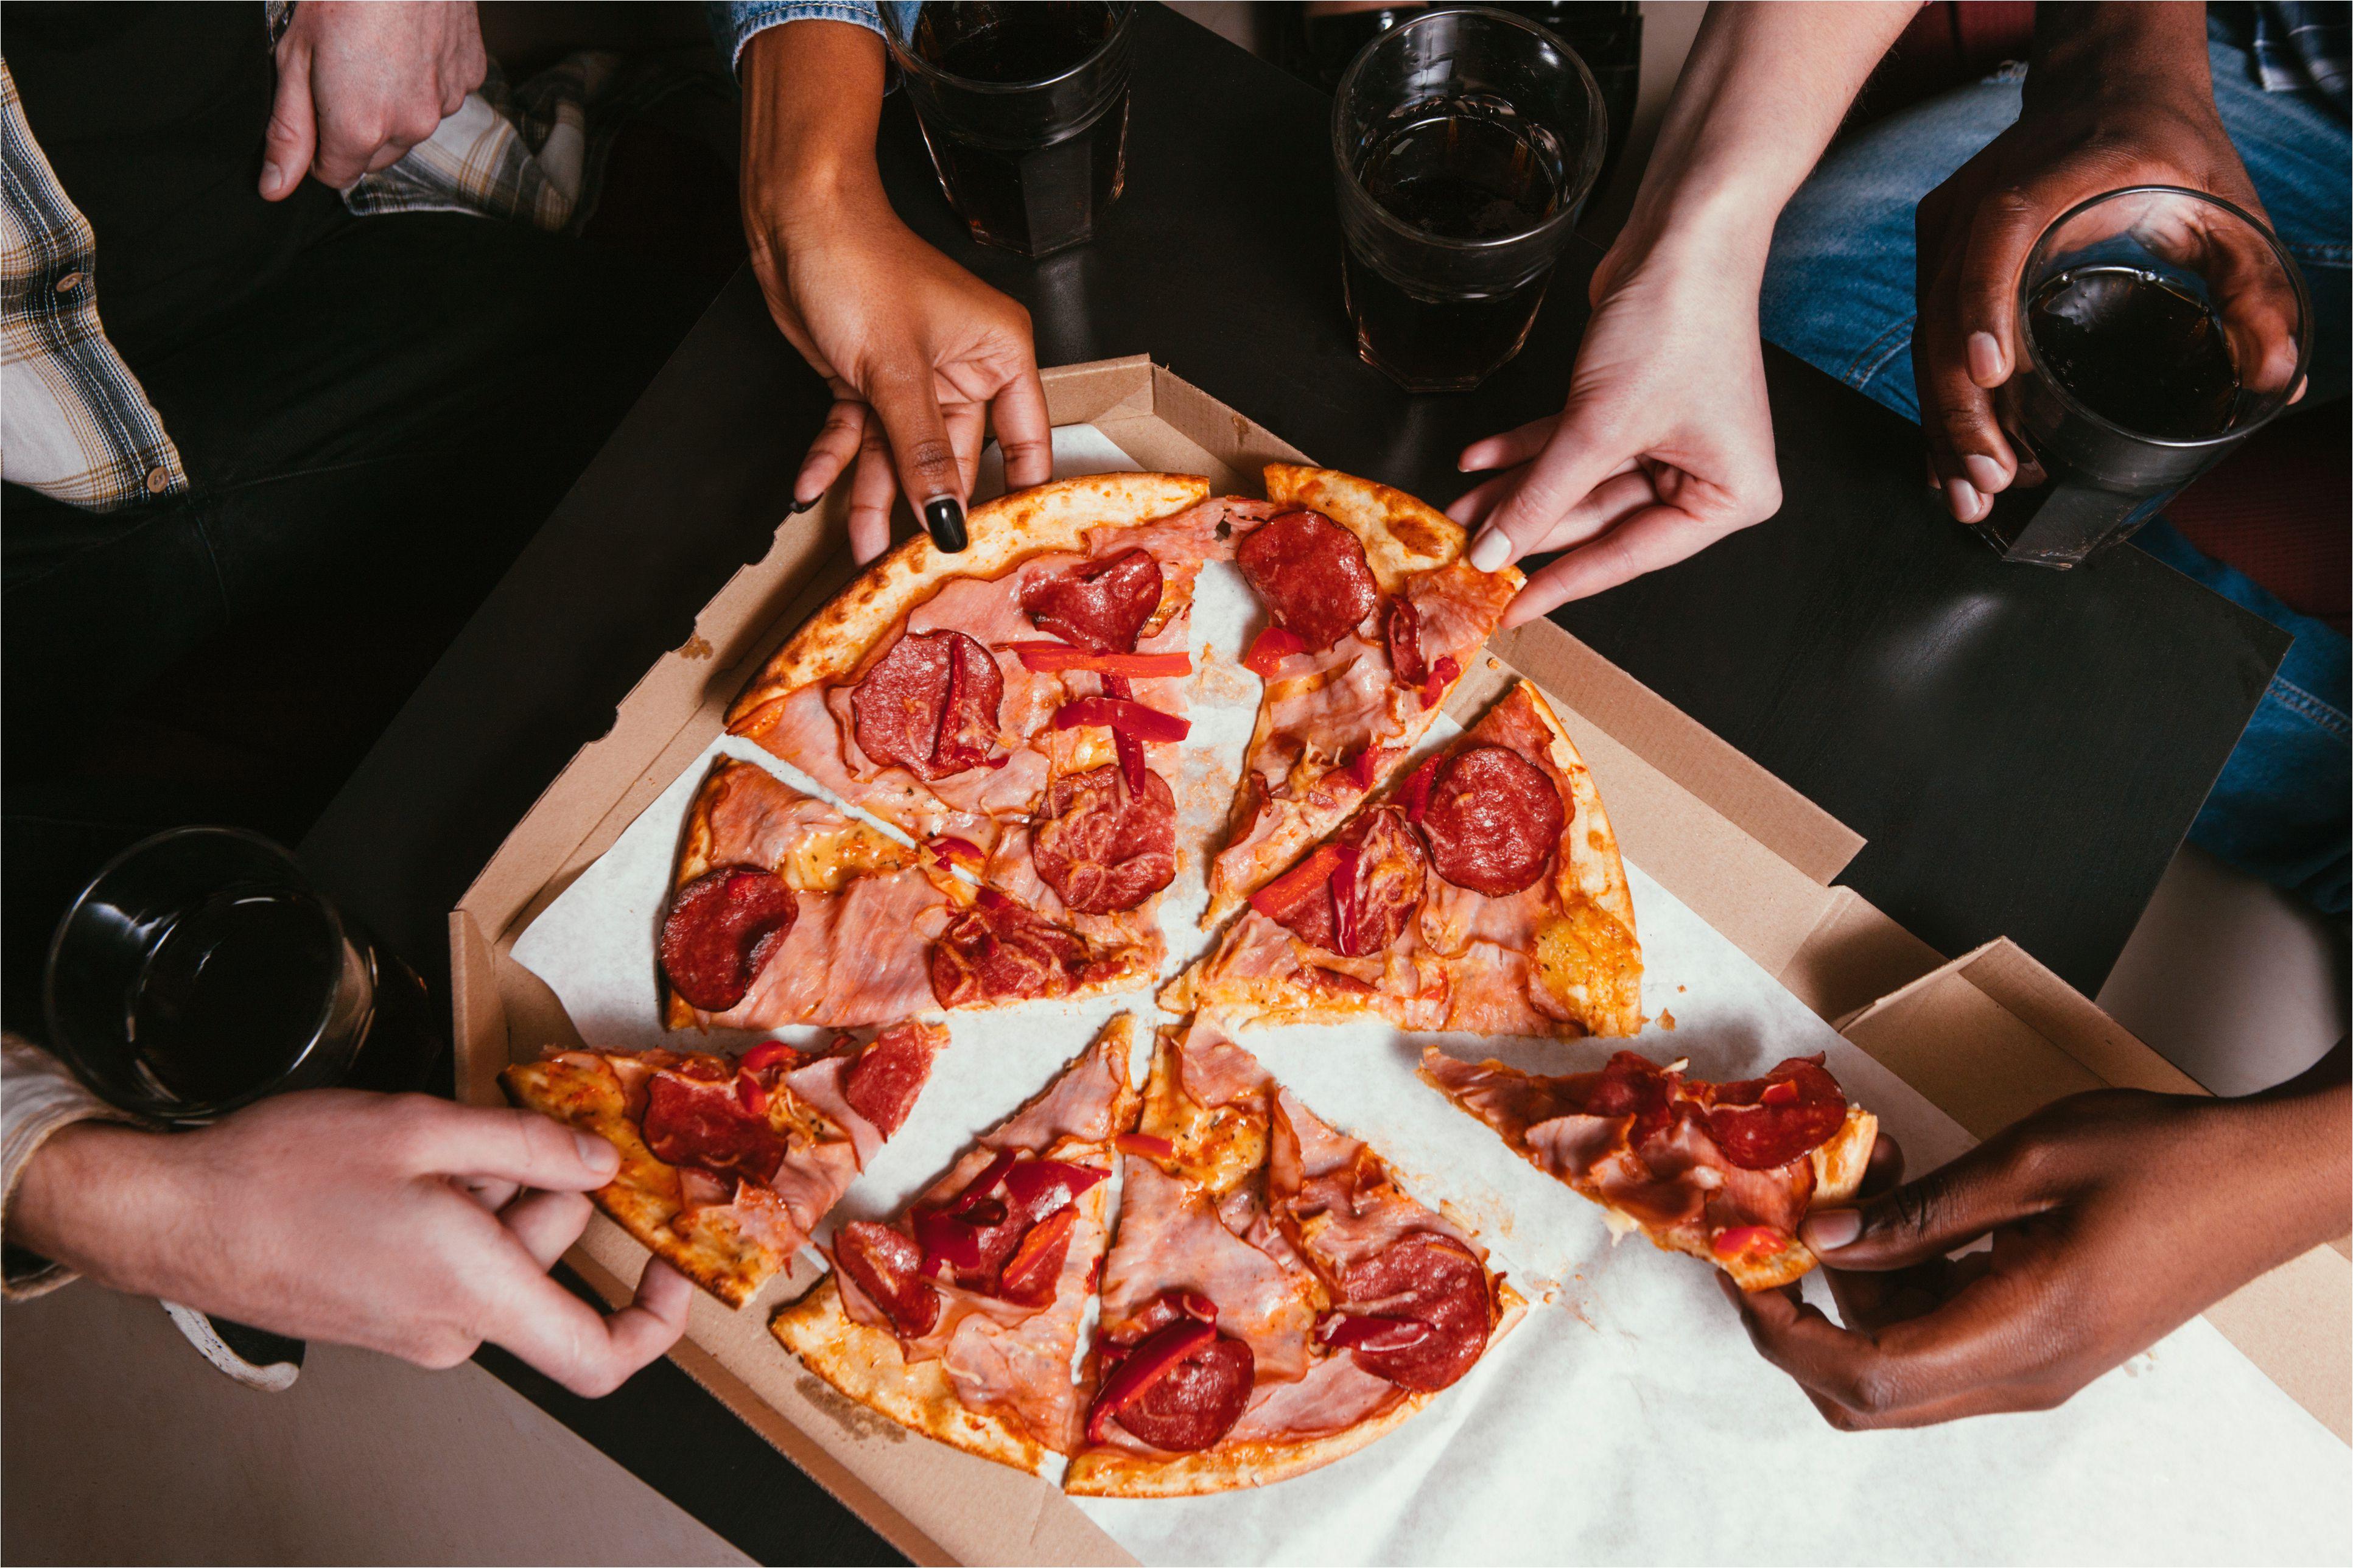 four friends company eat fresh pizza at home 680833190 5aa212418023b90037fefac0 jpg